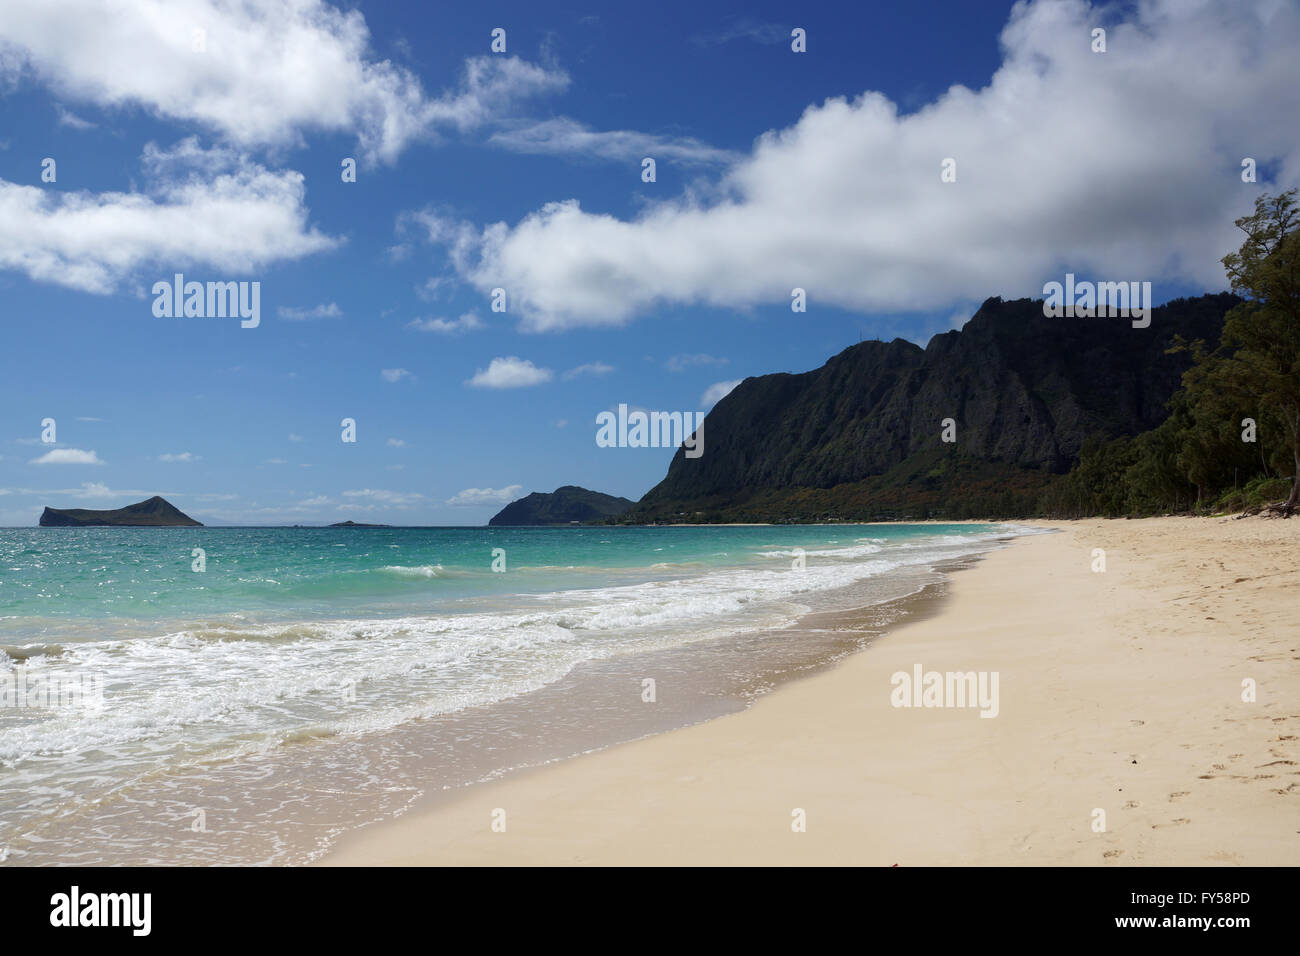 Gentle wave lap on Waimanalo Beach looking towards Rabbit island and Rock island on a nice day Oahu, Hawaii.  July - Stock Image